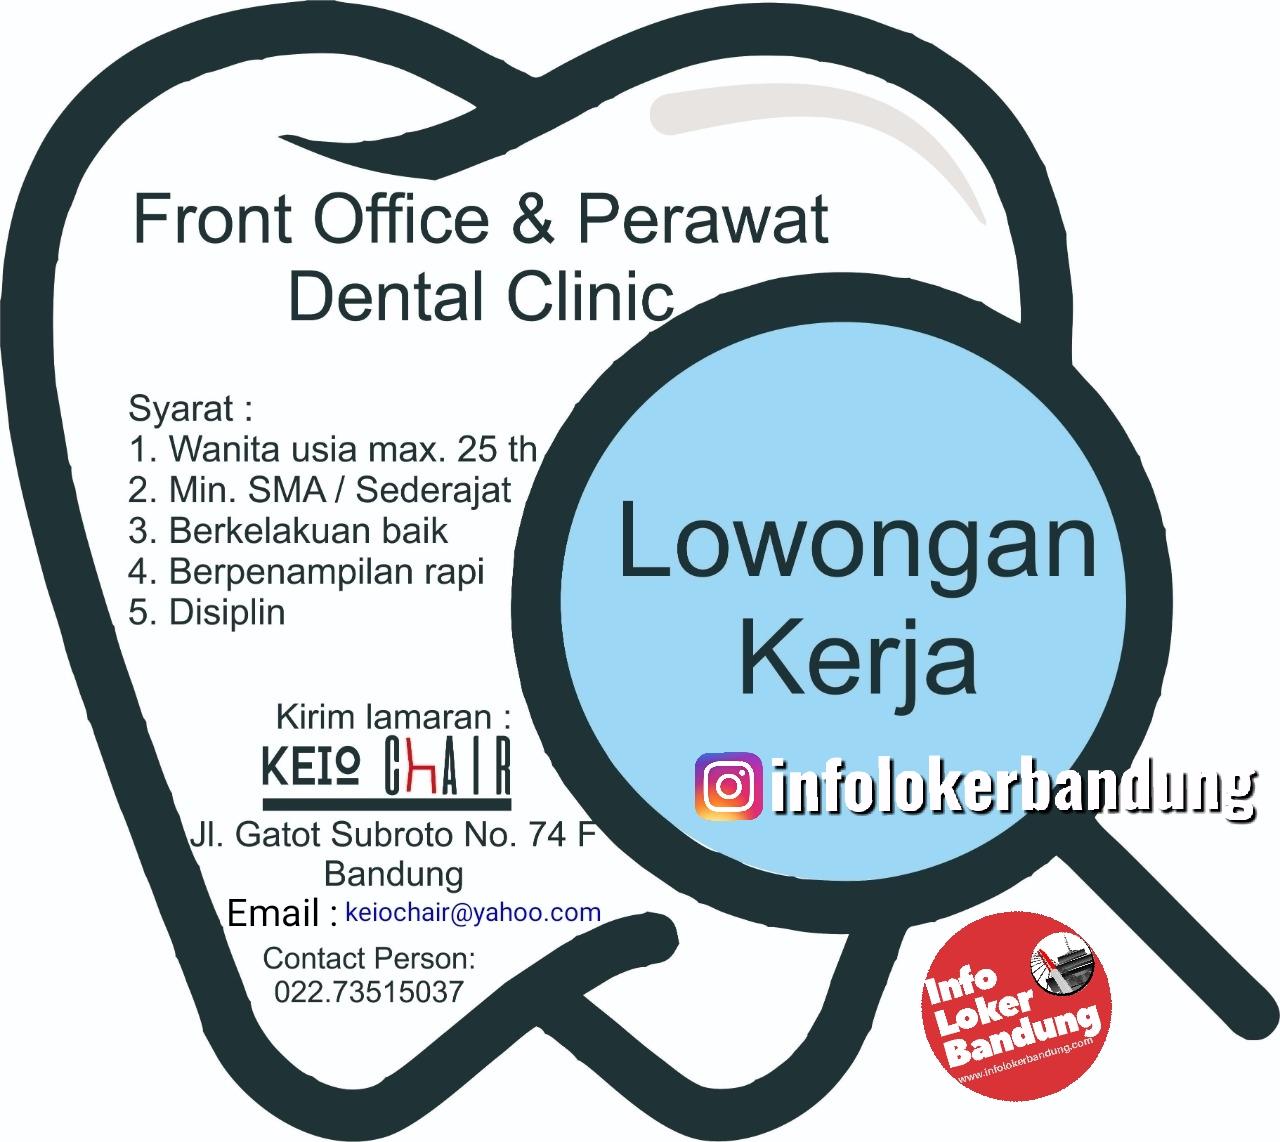 Lowongan Kerja Front Office & Perawat Dental Clinic Keio Chair Bandung September 2019